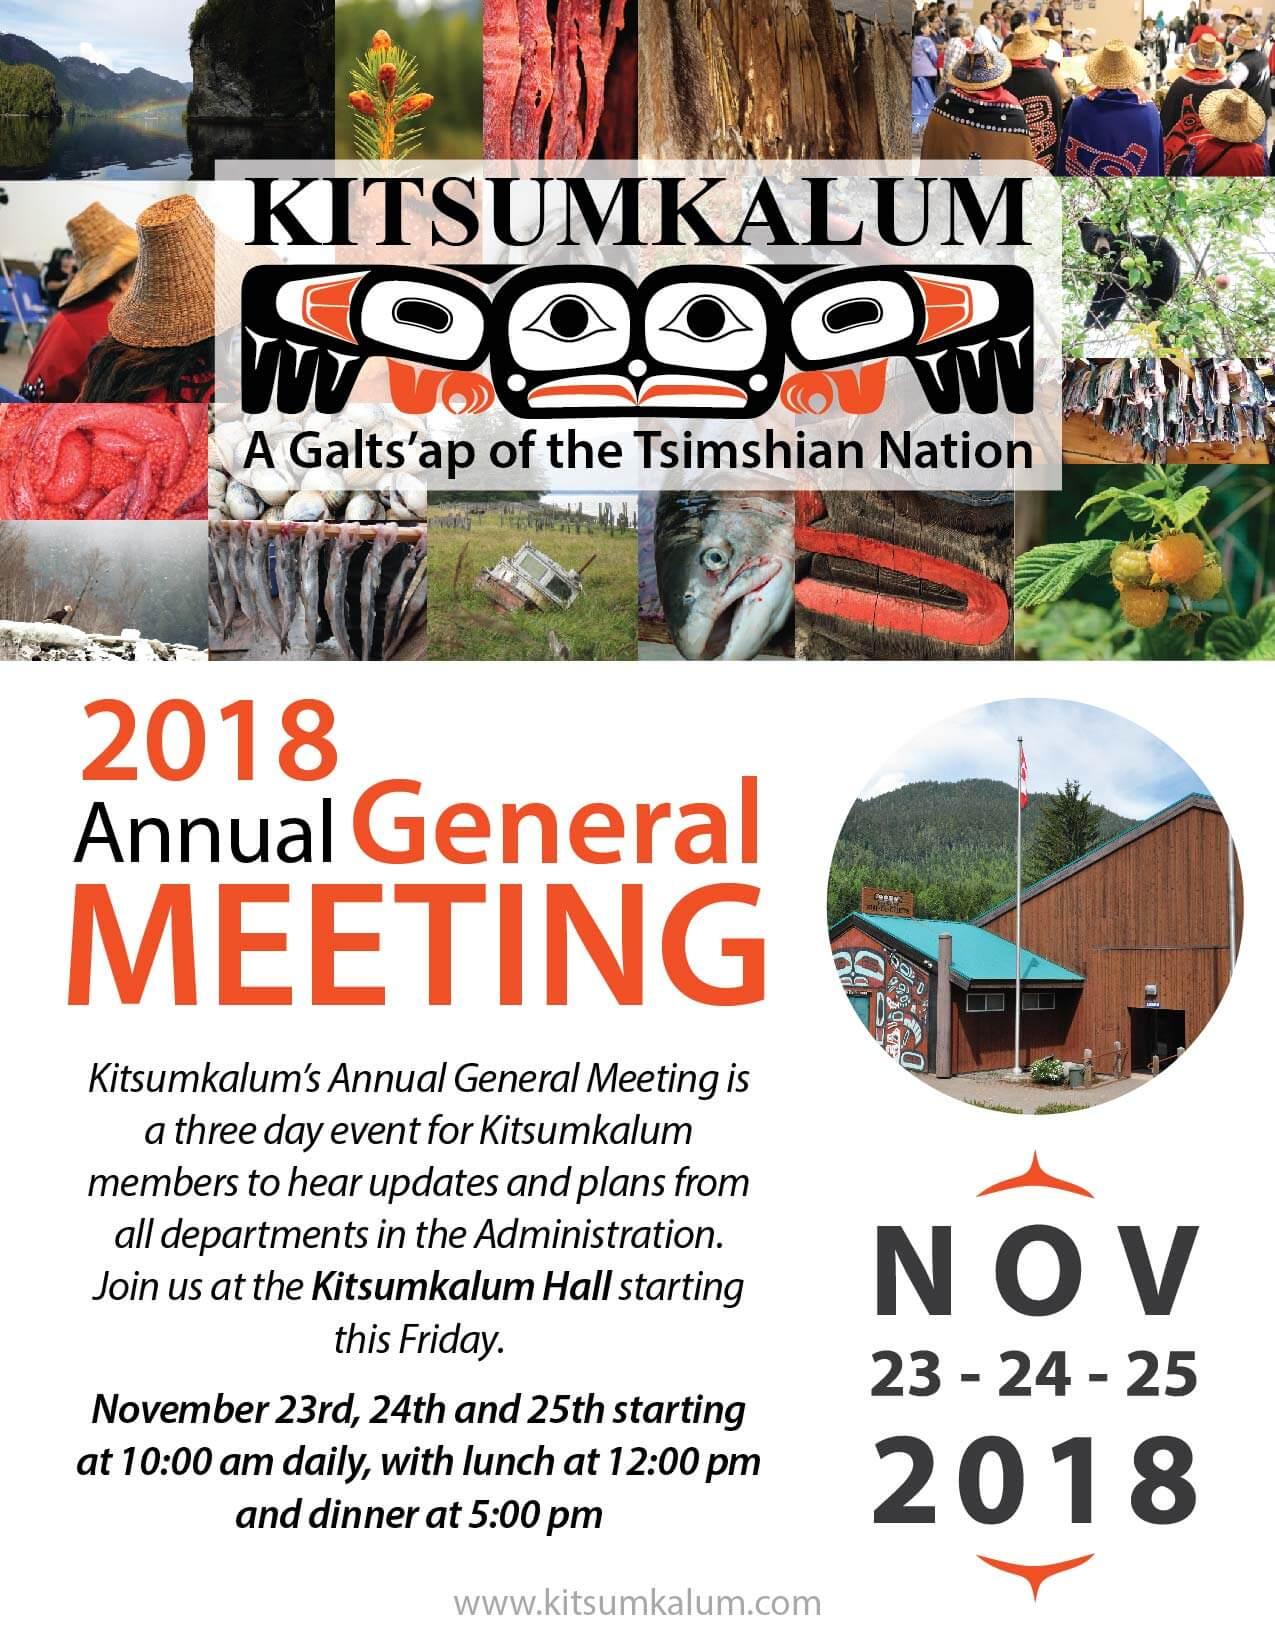 Kitsumkalum AGM NOV 23-24-25, 2018